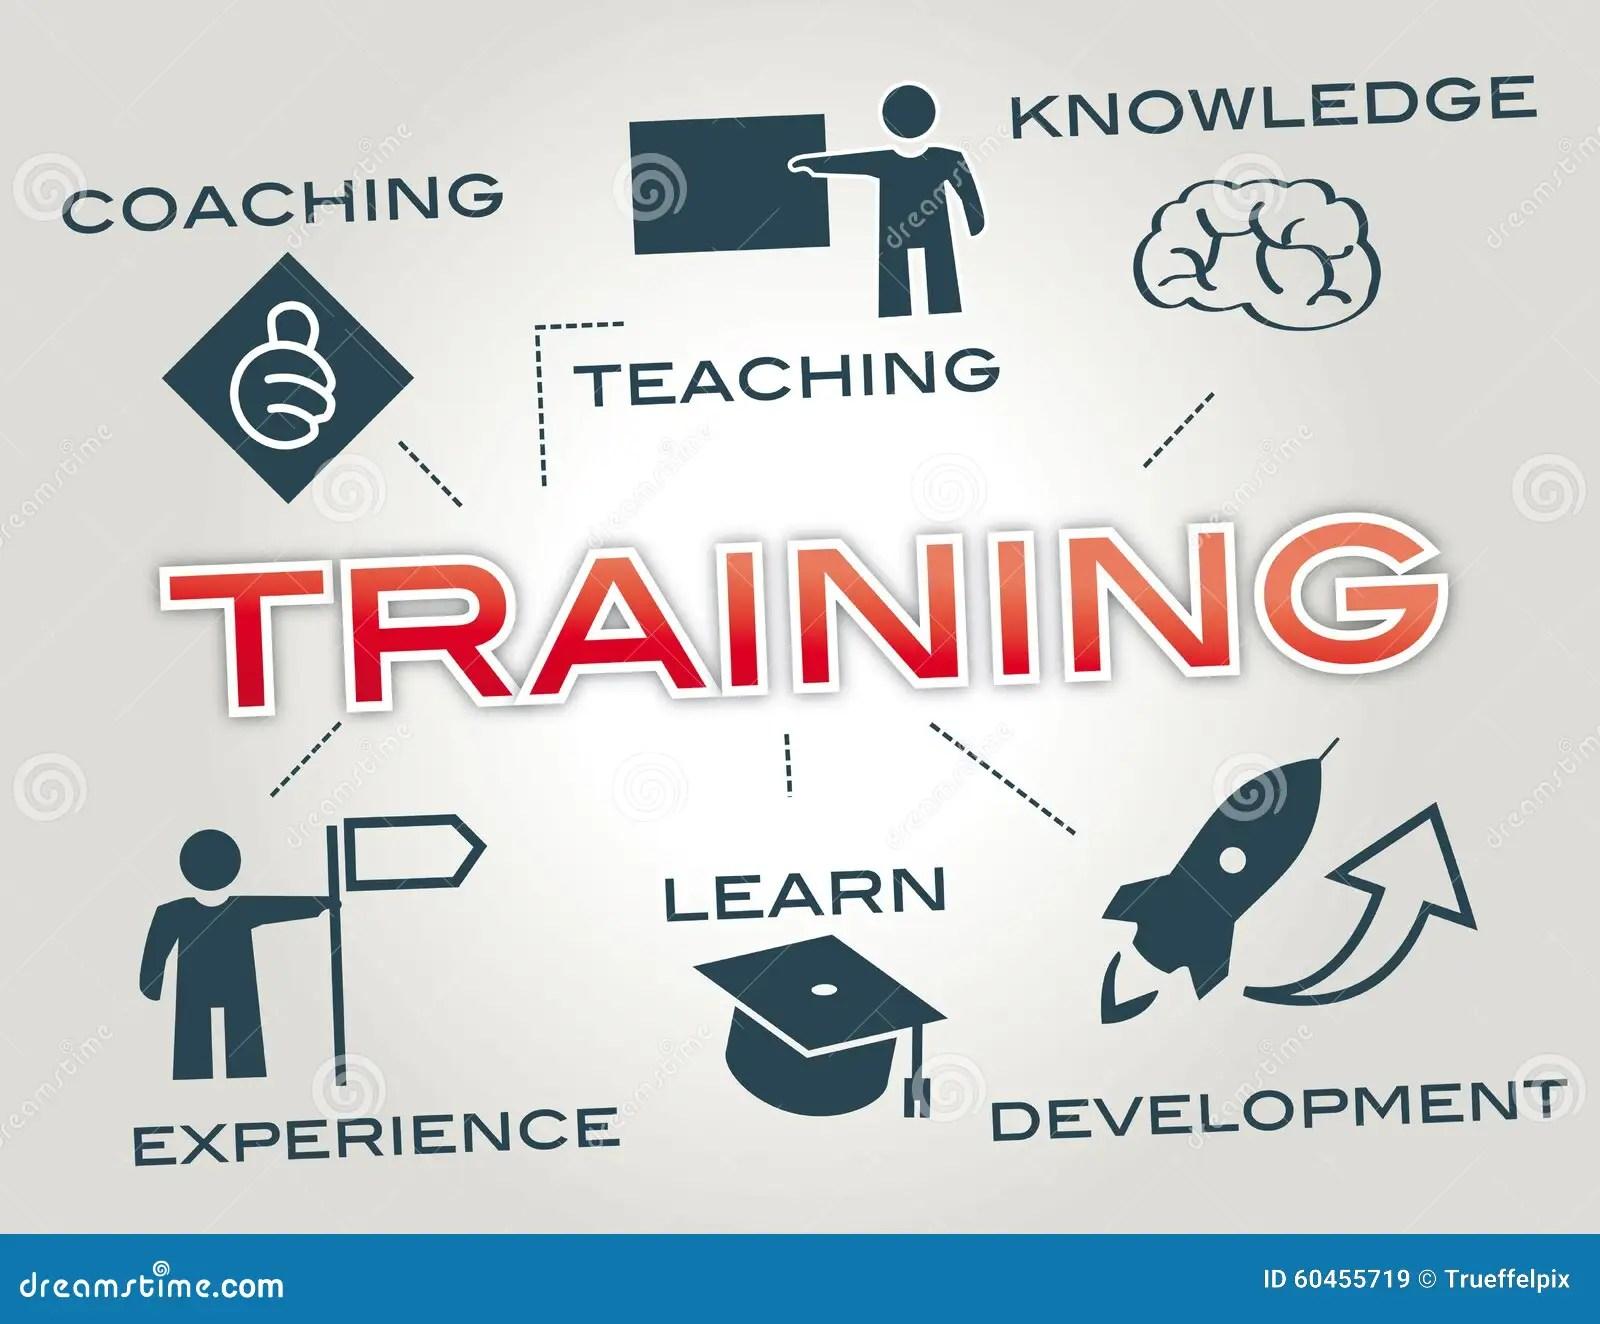 Yoga Center Business Plan Bplans Training Symbols Stock Illustration Image 60455719